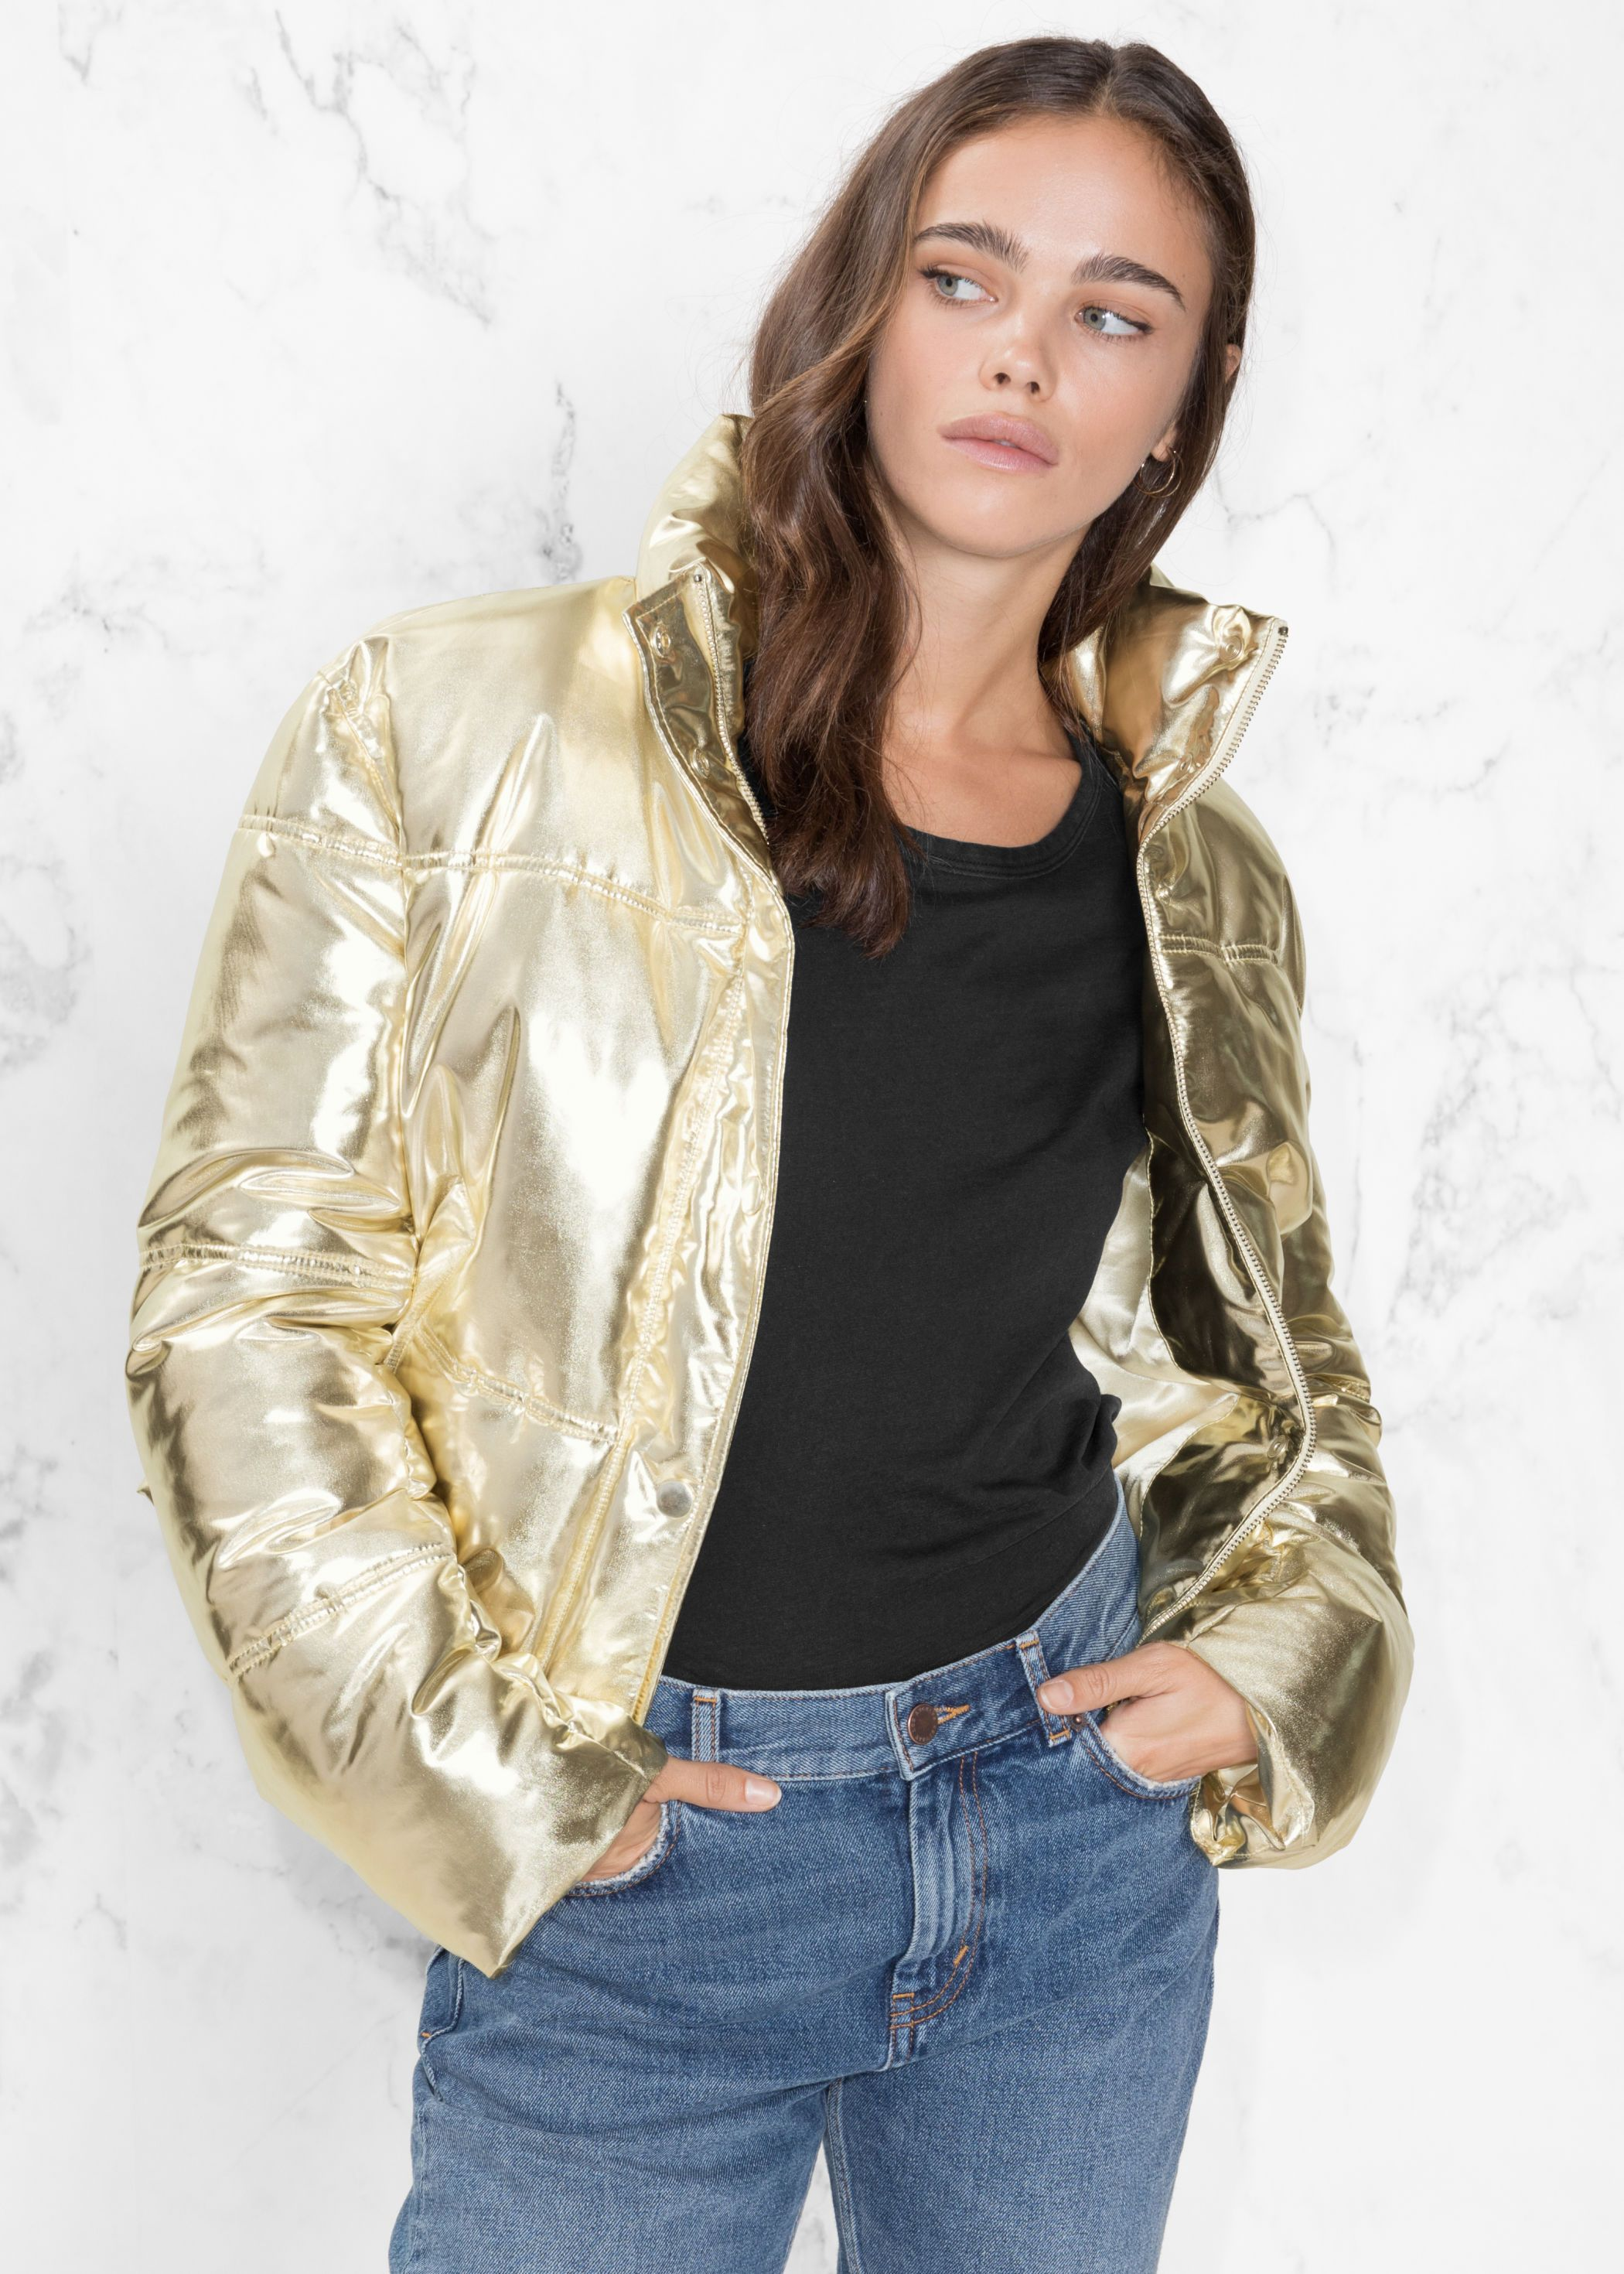 Metallic Puffer Jacket In 2020 Jackets Fashion Puffer Jackets